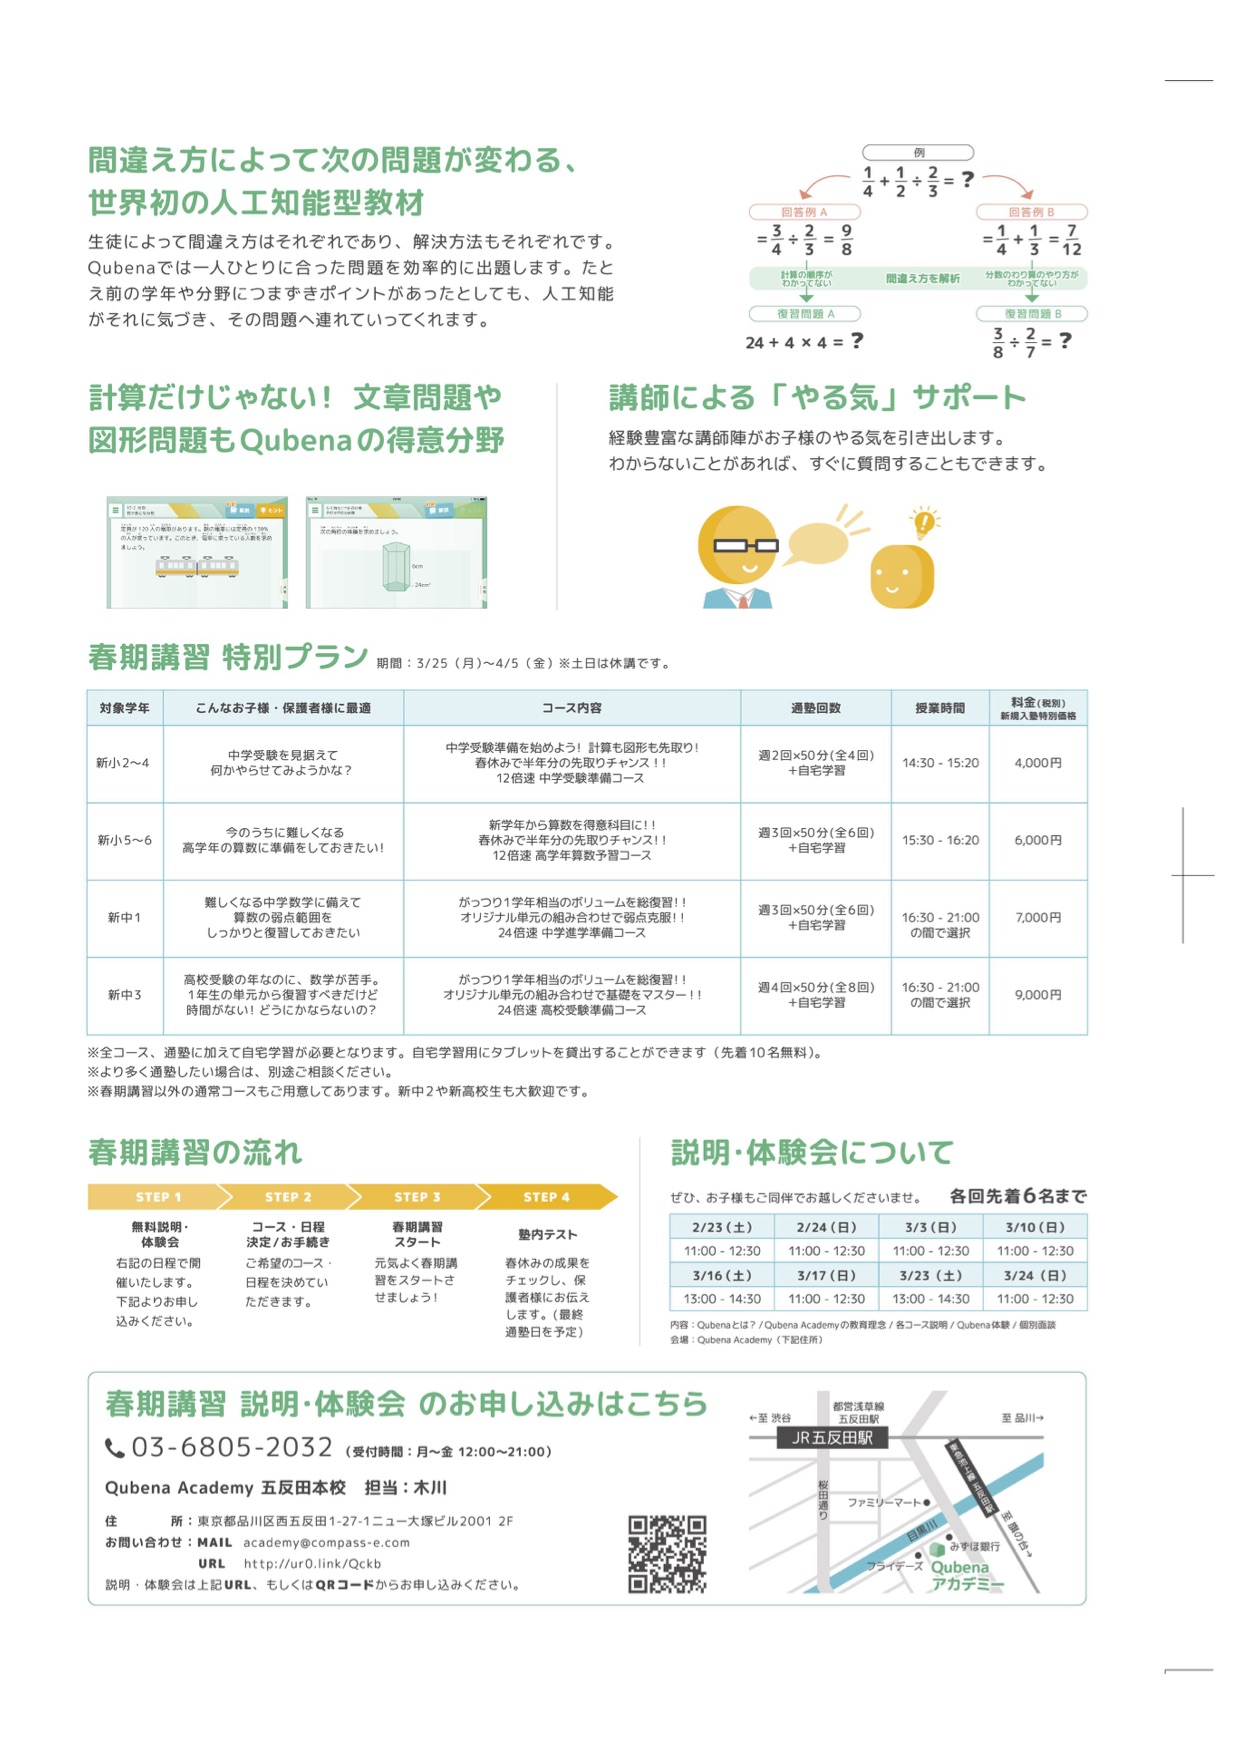 Qubenaアカデミー五反田本校 2019年度春期講習のご案内(2)